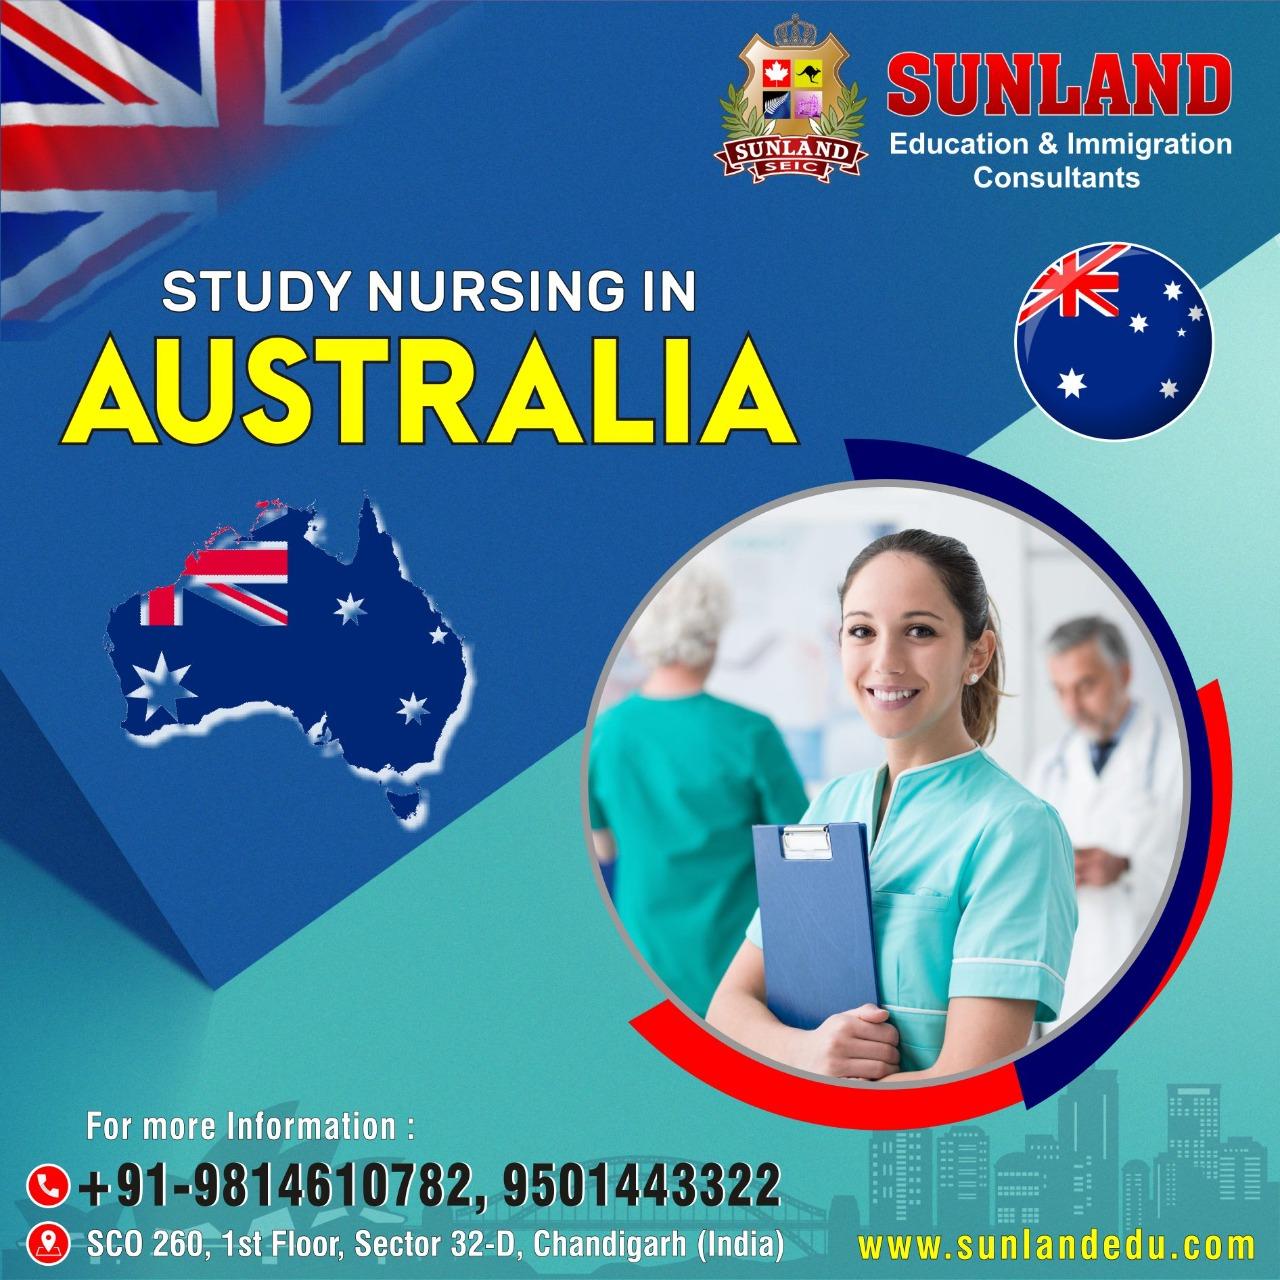 Study Nursing in Australia